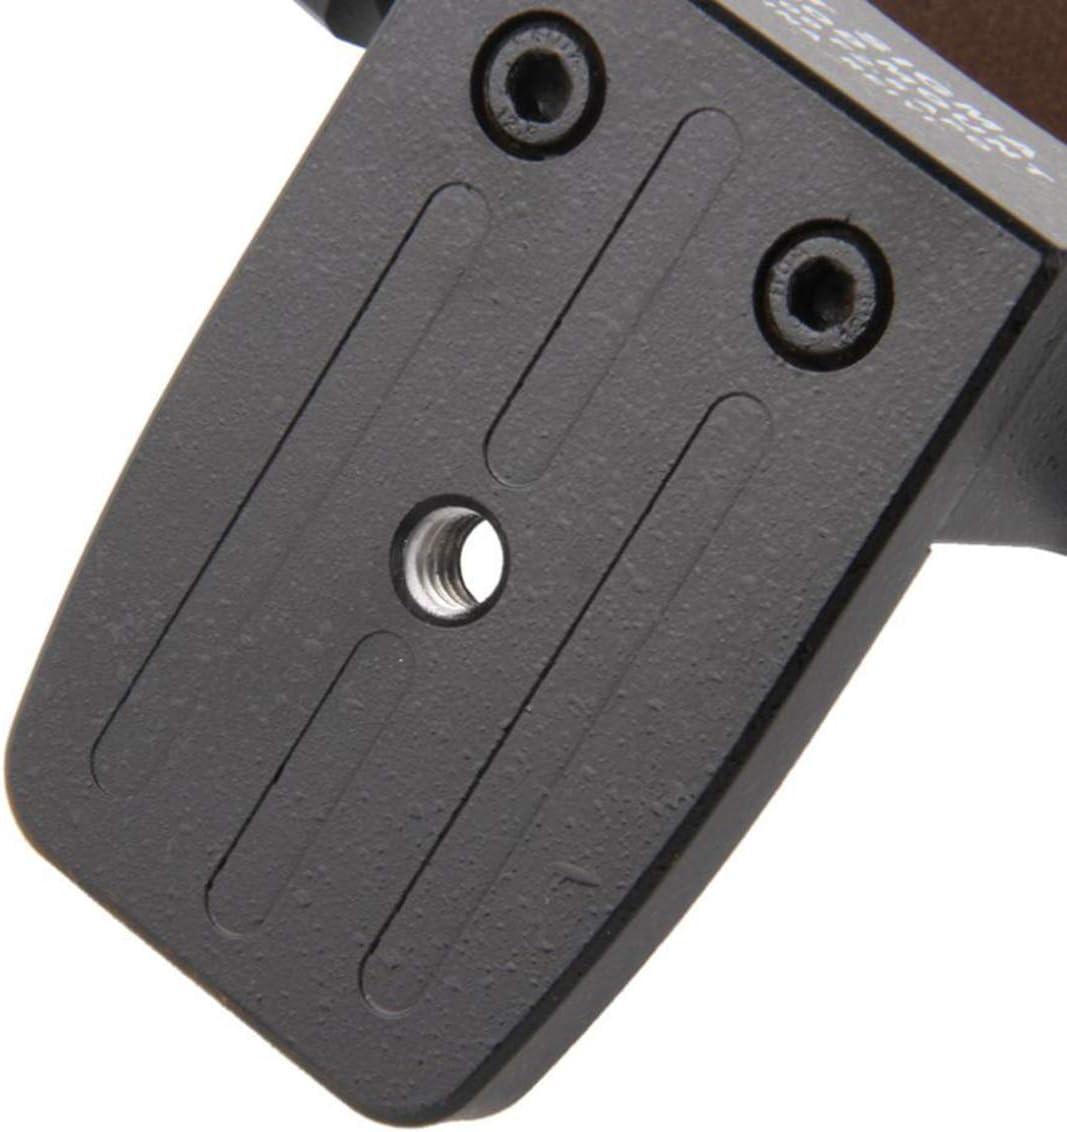 Semoic Metal Tripod Collar Mount Ring AF-S 80-200mm f//2.8D F2.8 IF ED Zoom Lens